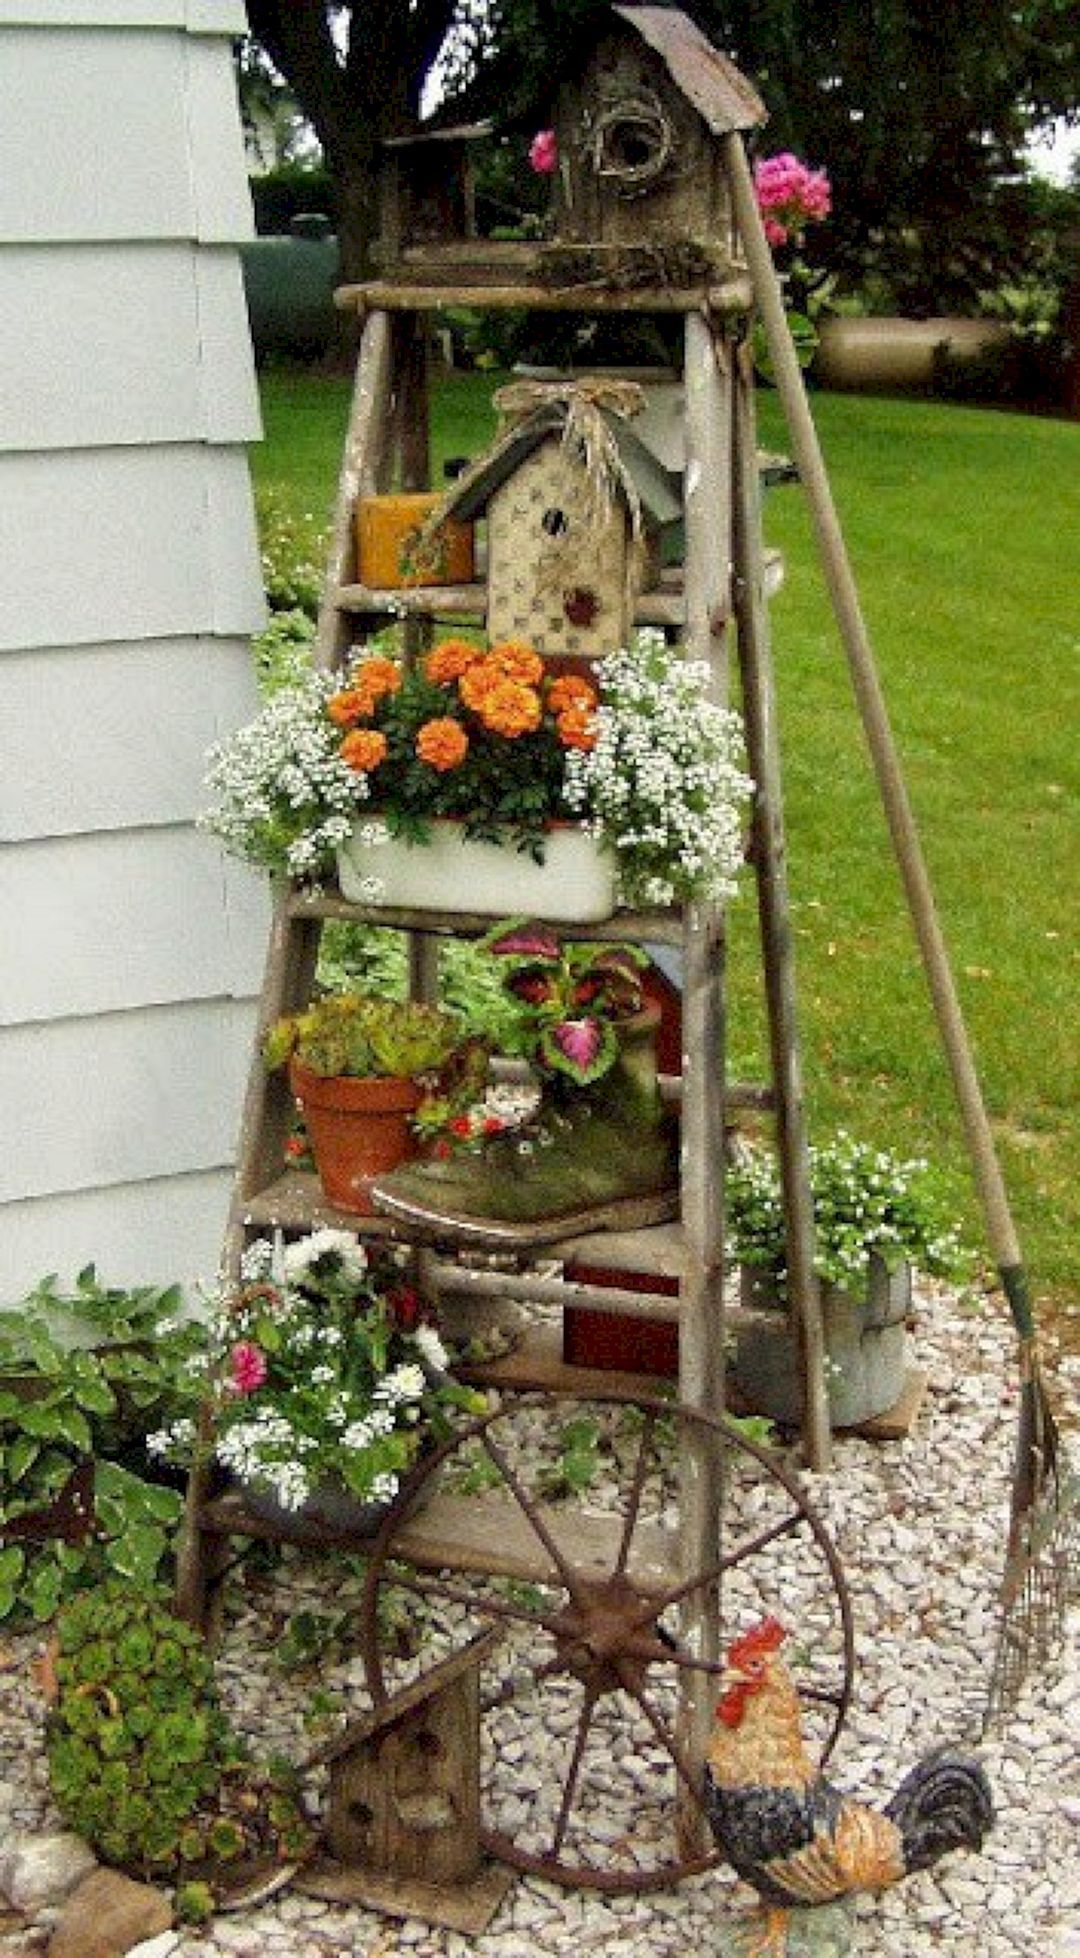 8 Brilliant DIY Vintage and Rustic Garden Decor Ideas on A